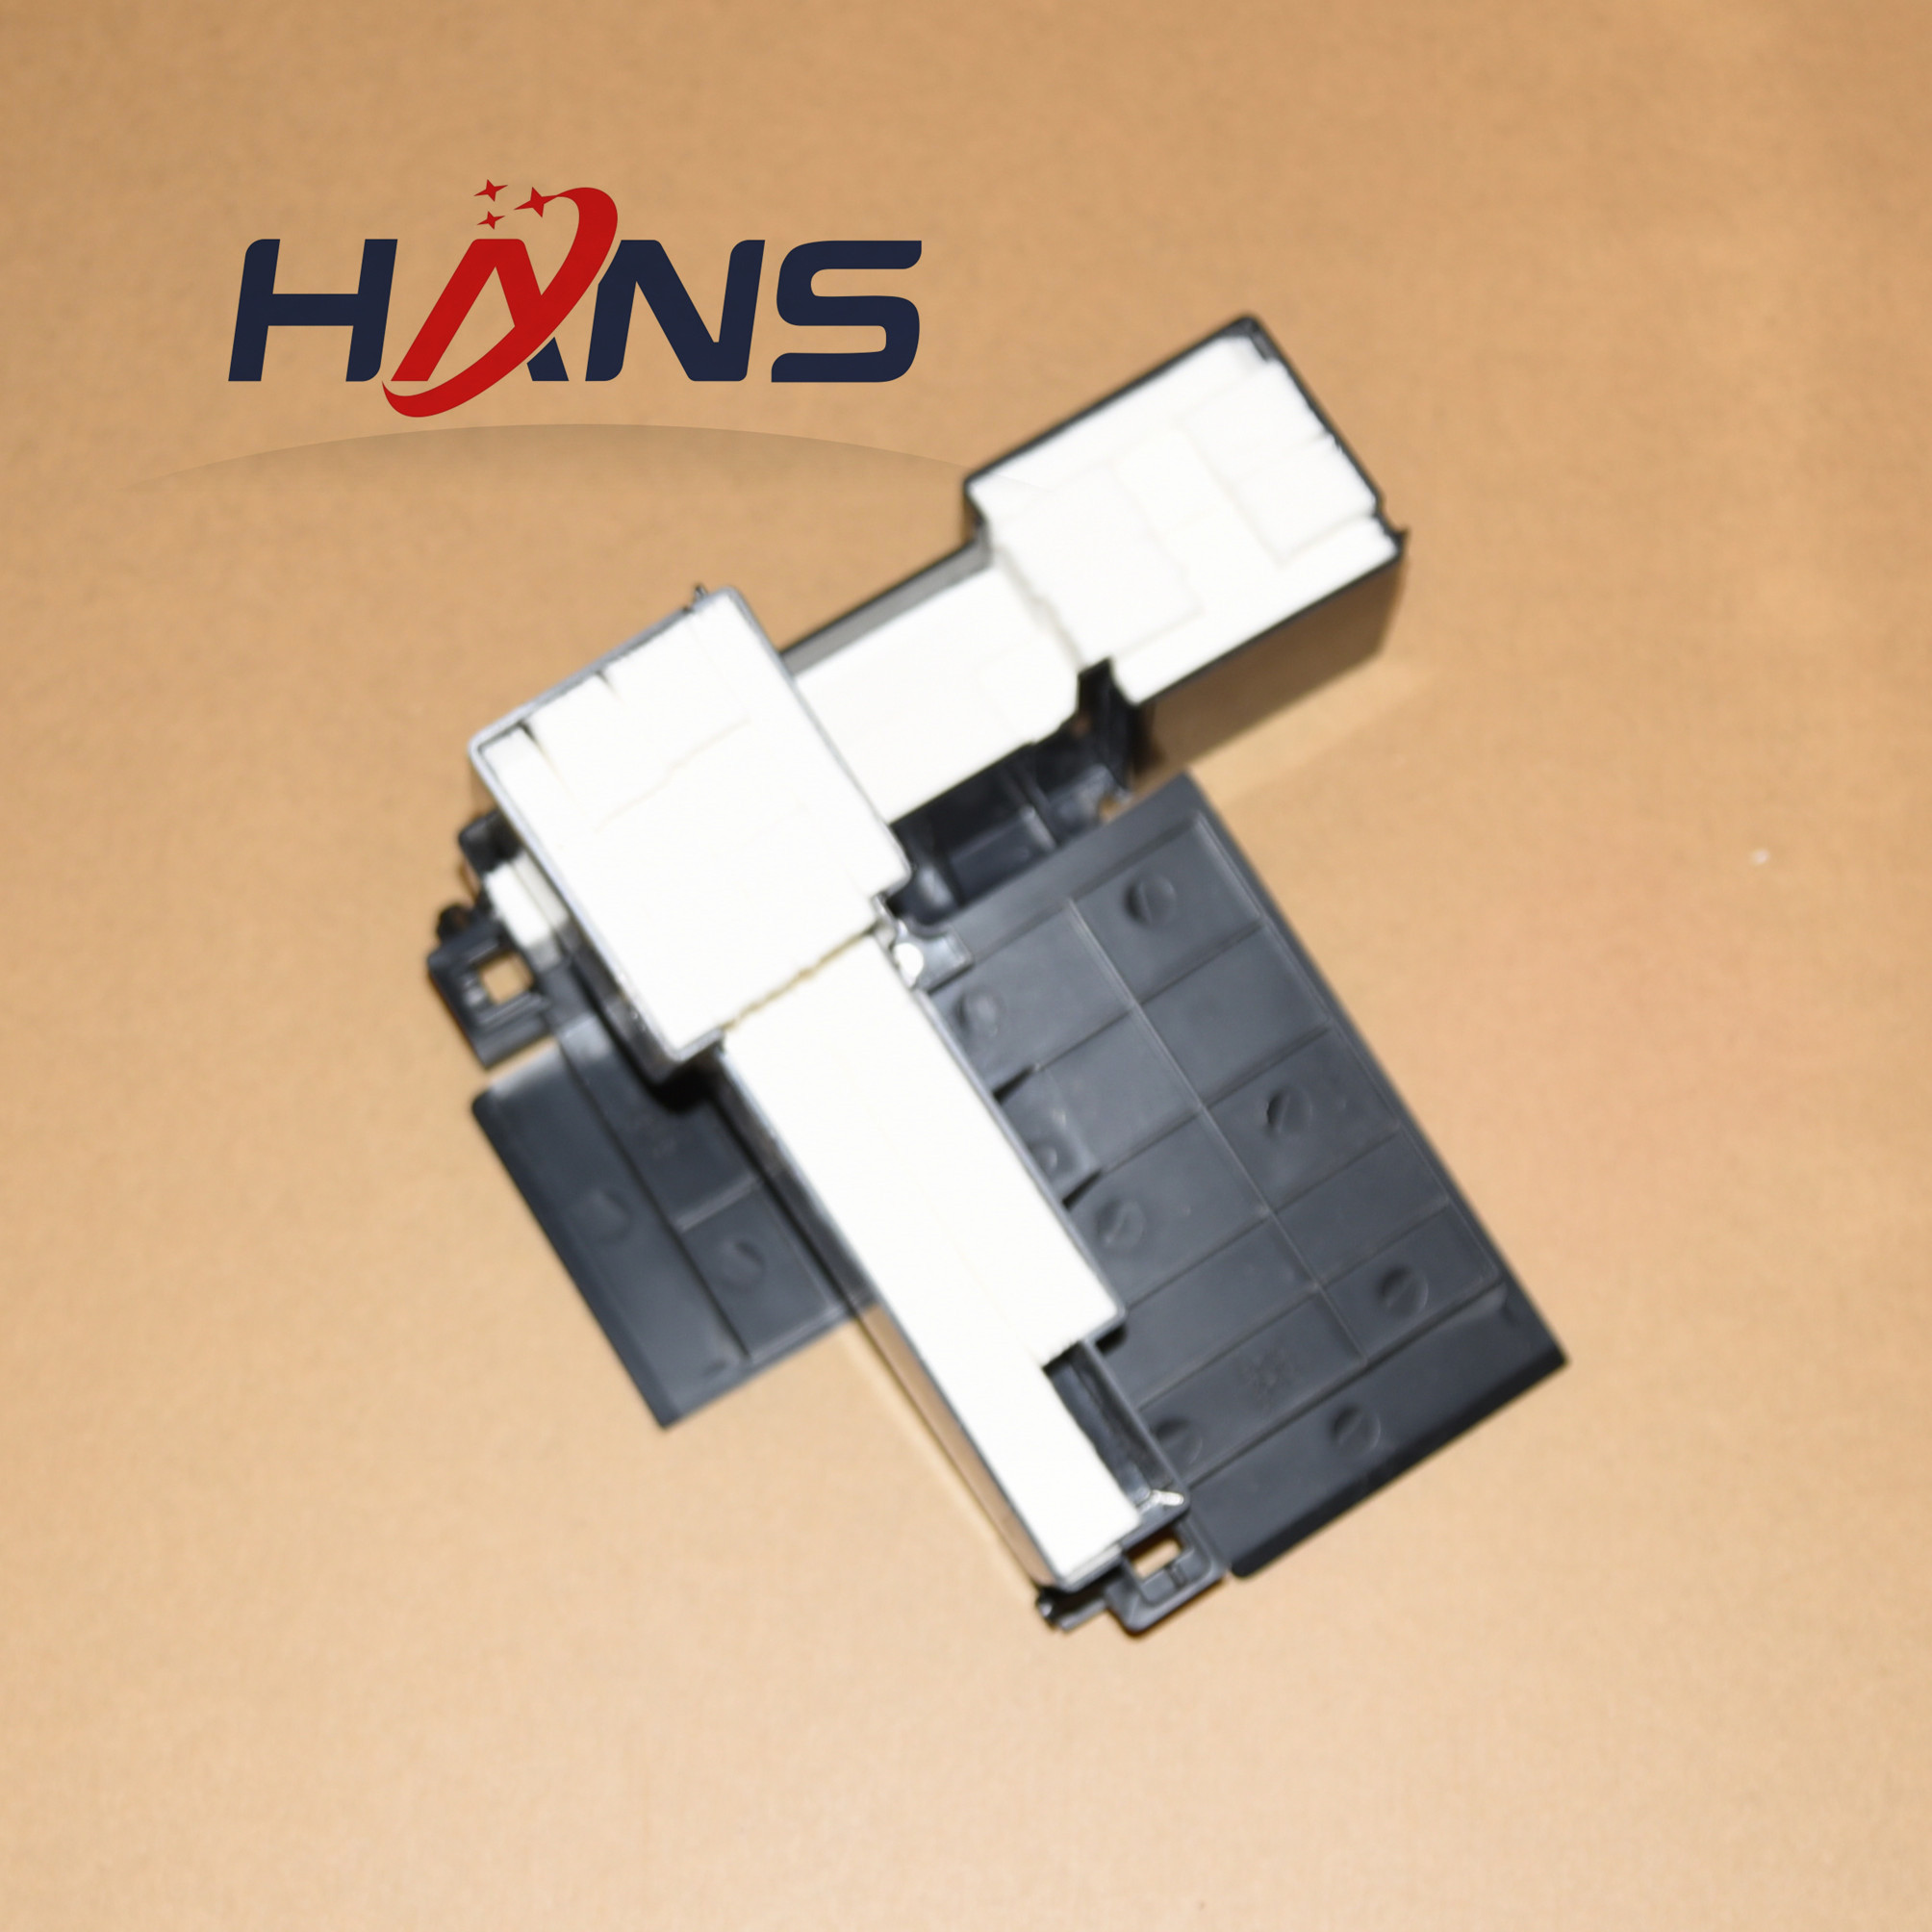 Image 2 - 16PCS Original L301 Waste Ink Tank Pad Sponge for Epson L300 L303 L350 L351 L353 L358 L355 L111 L110 L210 L211 ME101 ME303 ME401-in Printer Parts from Computer & Office